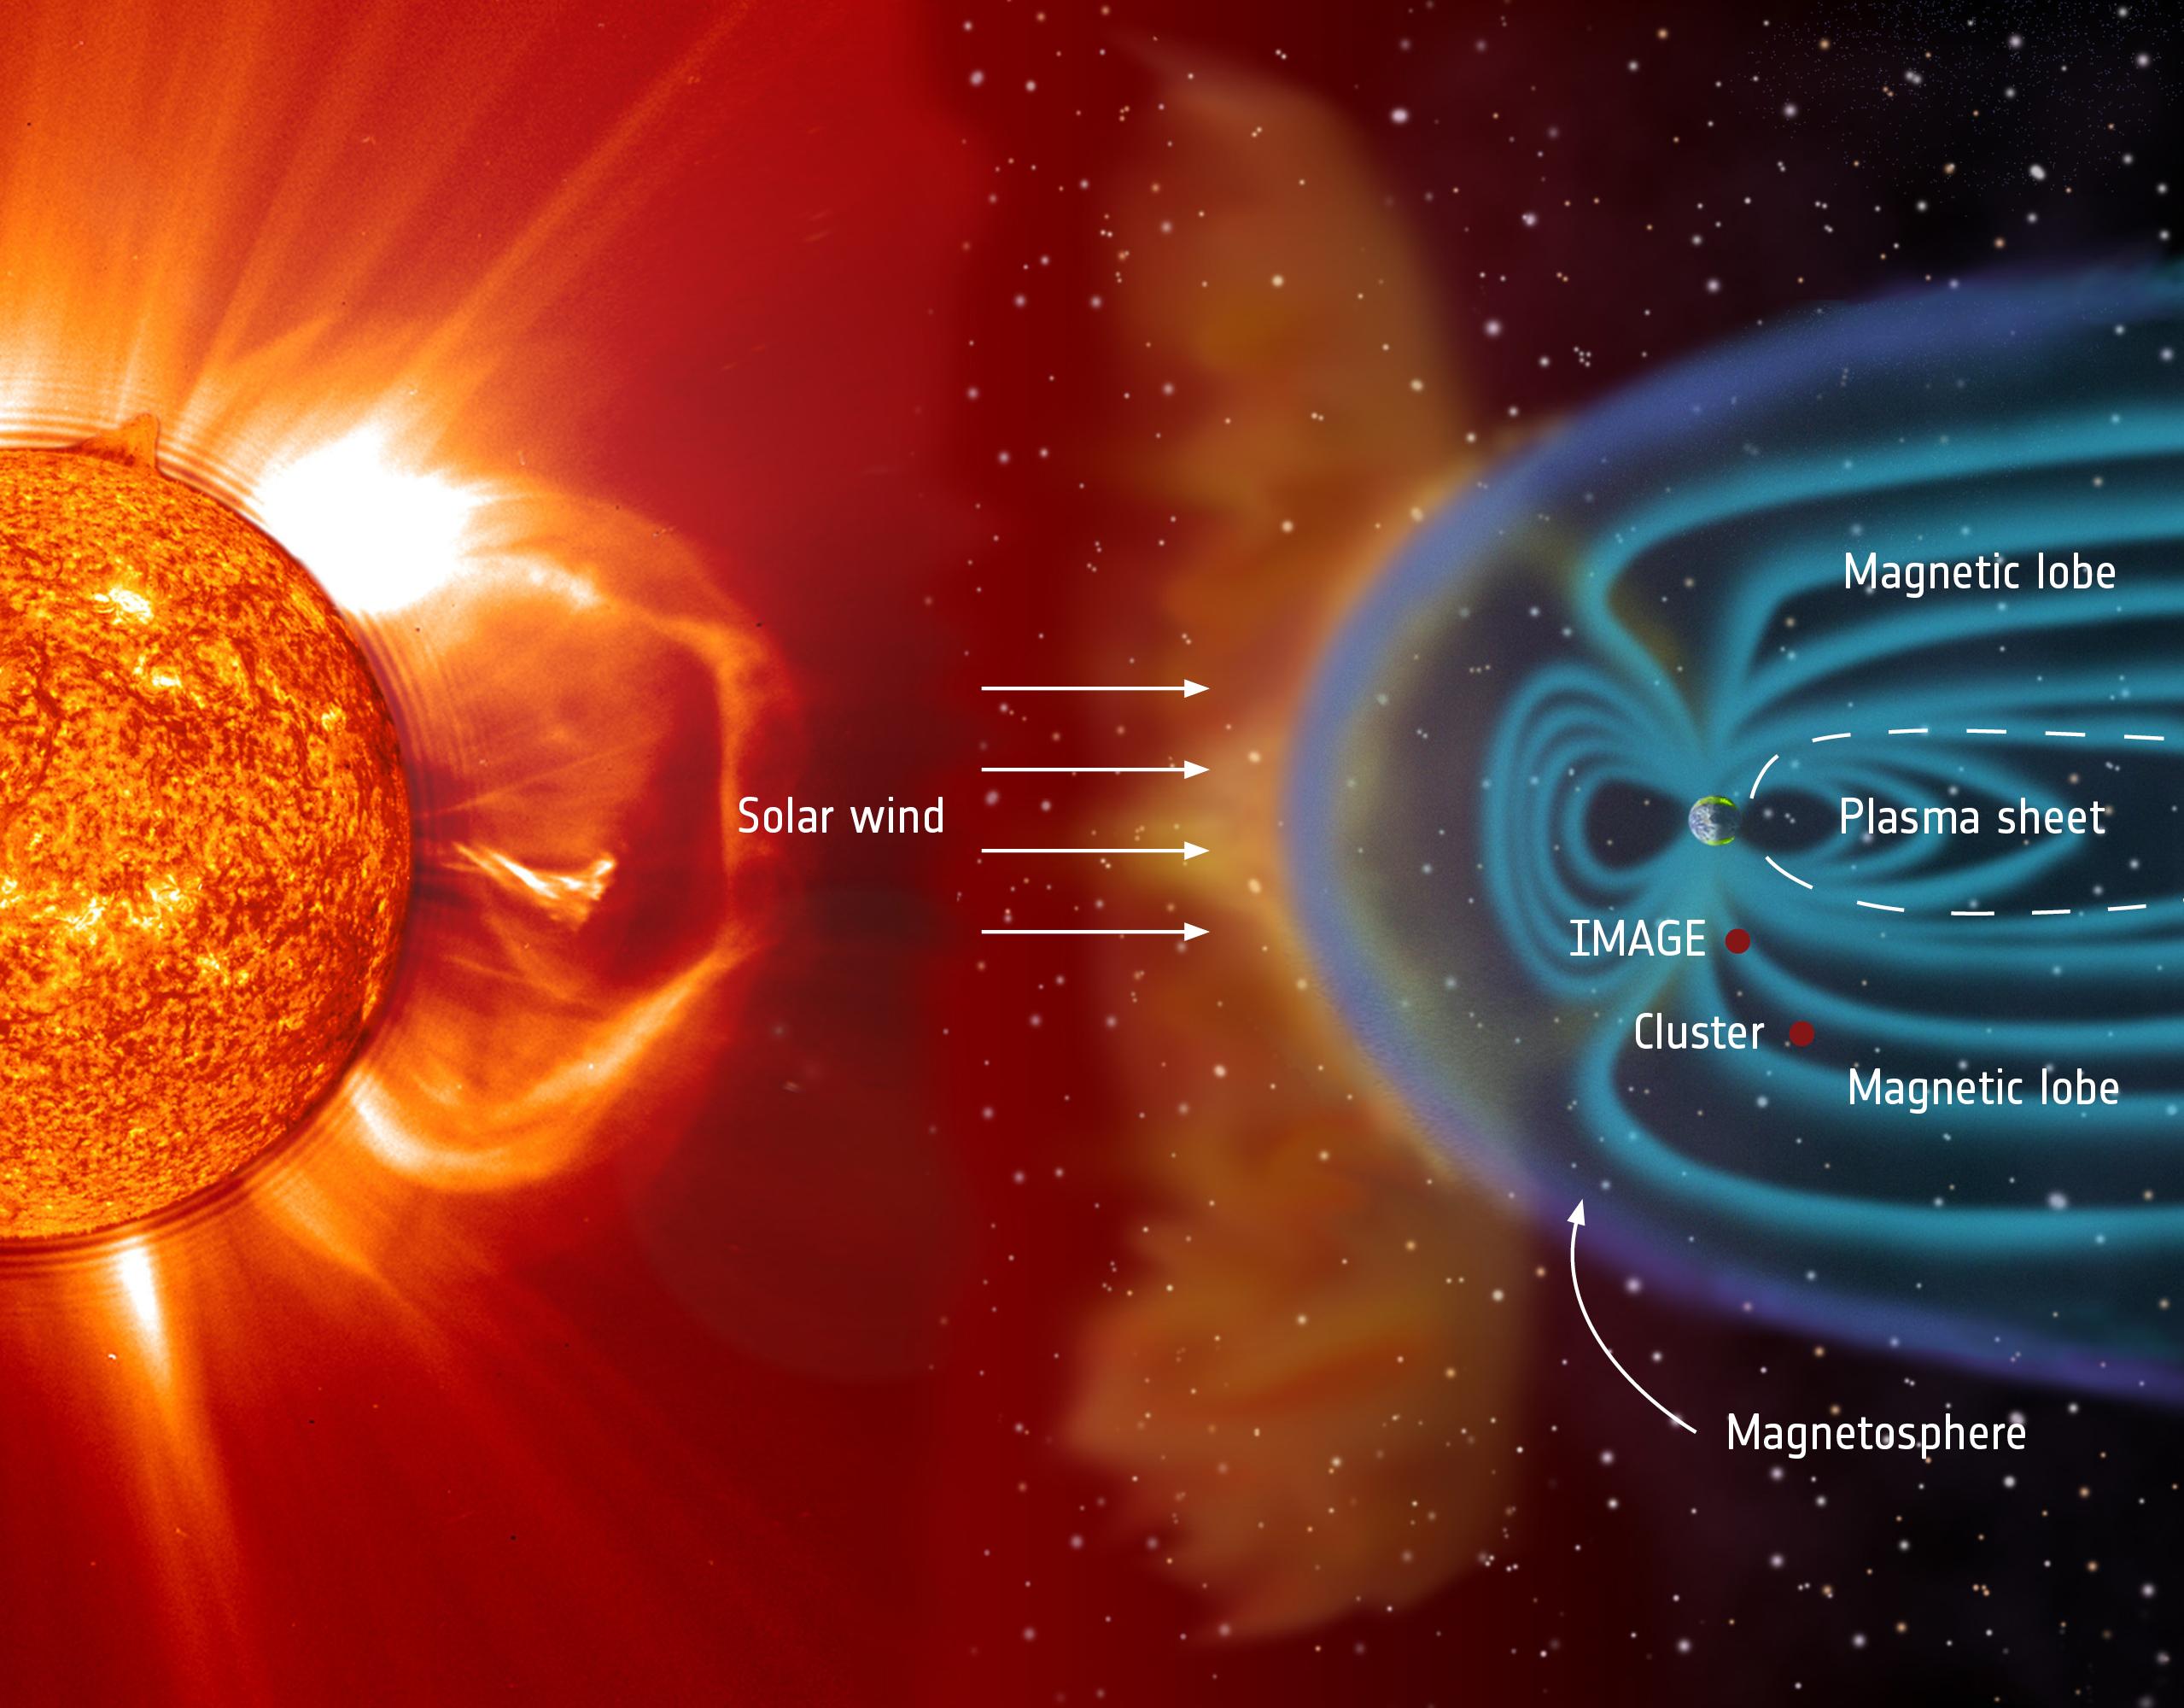 1567216158753-Cluster_and_Image_during_aurora_observation.jpg